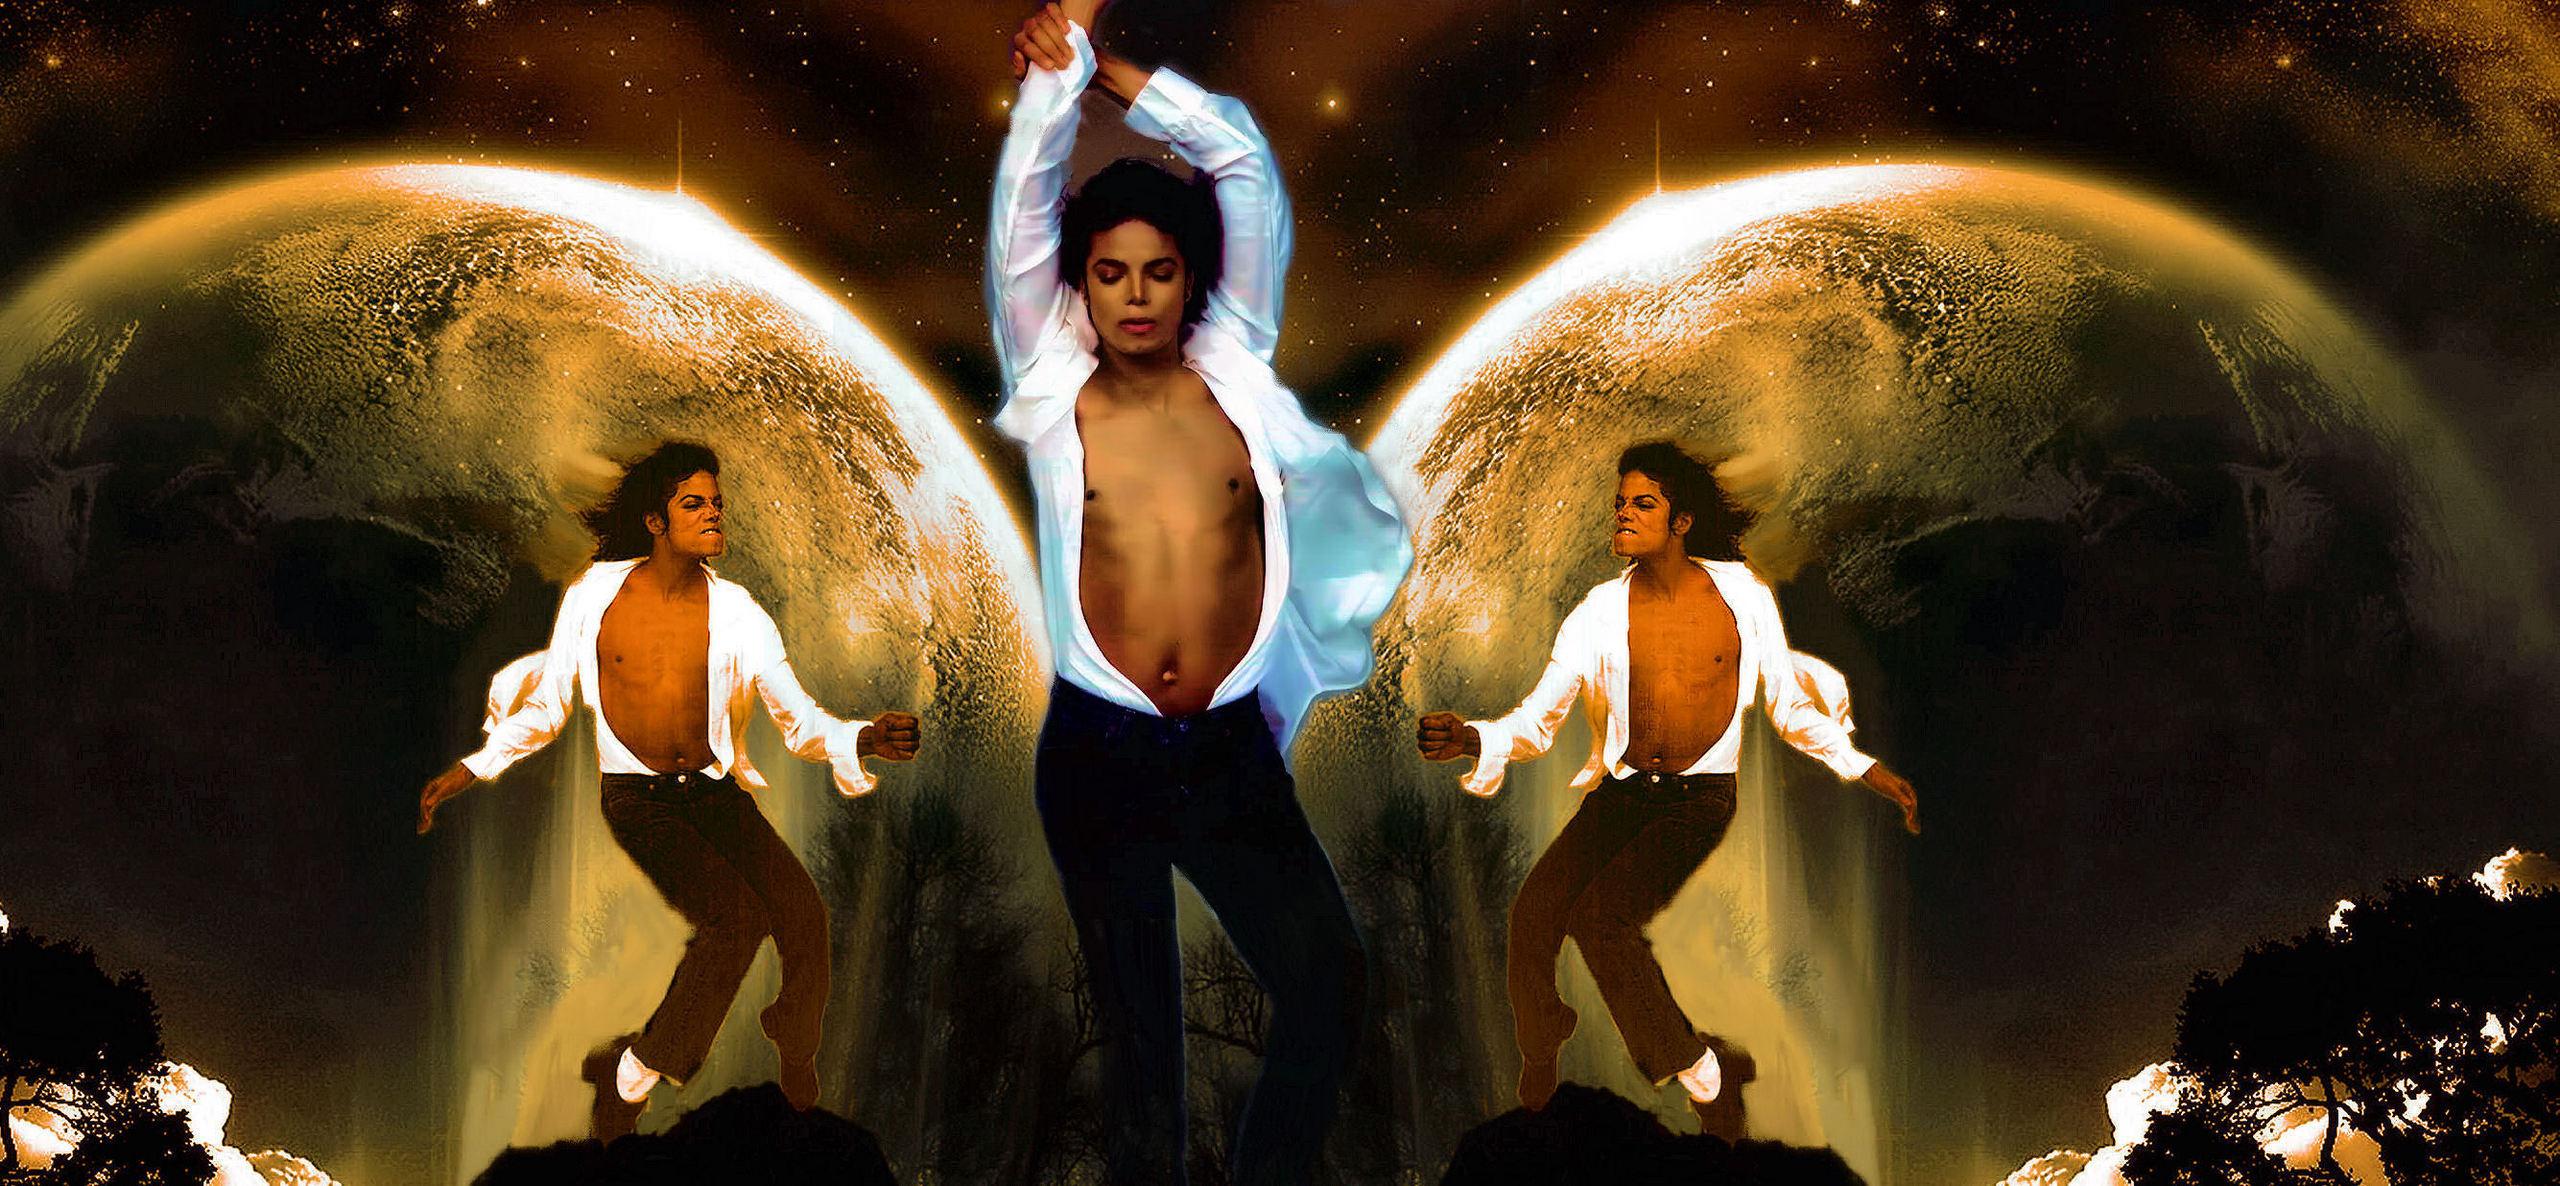 MJ Fantasy - Michael Jackson Photo (11137274) - Fanpop